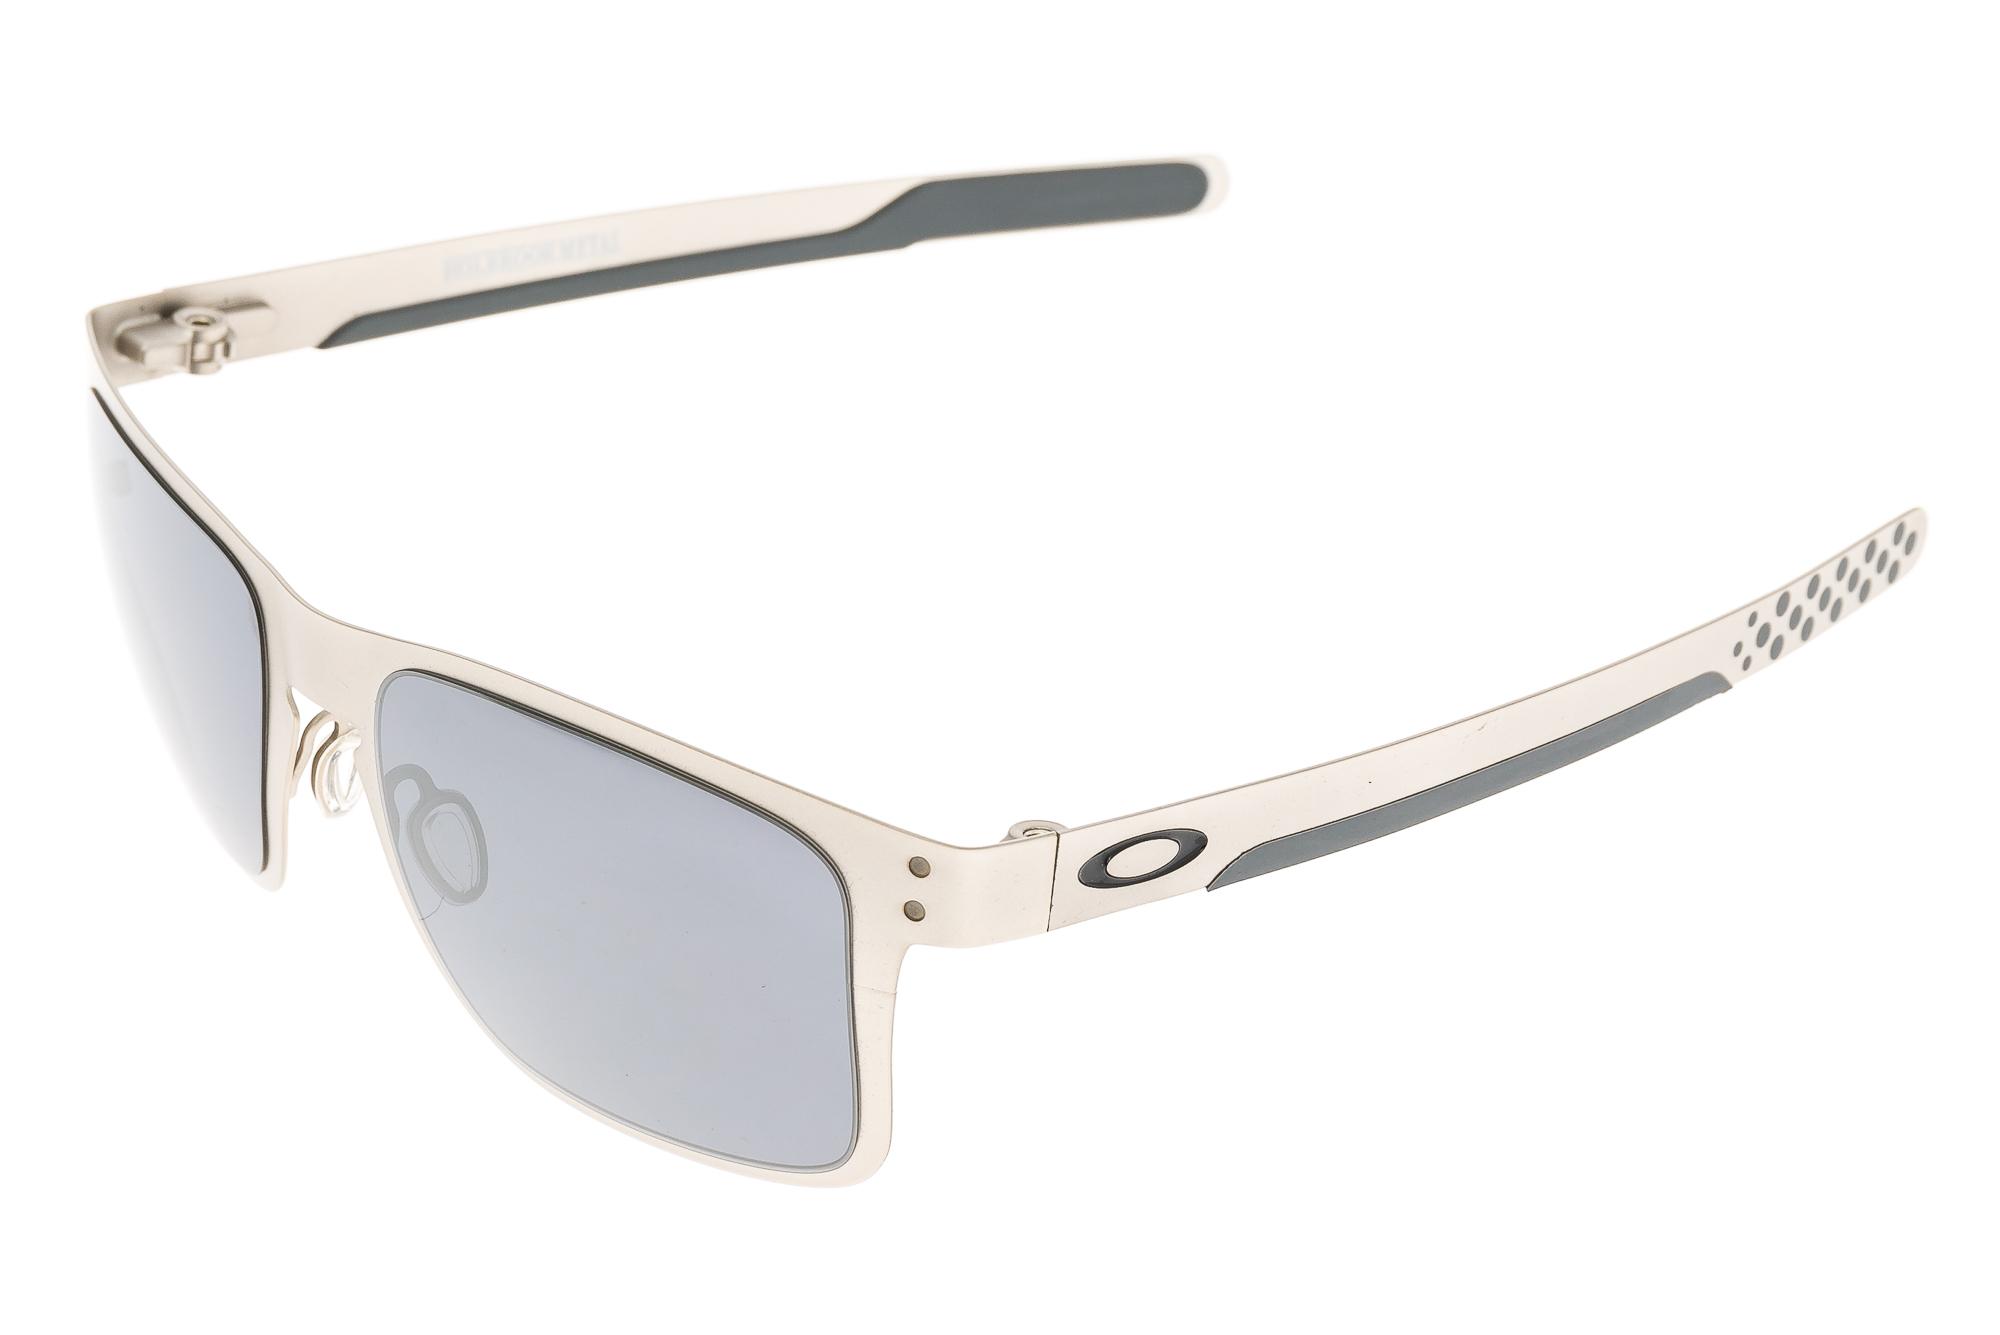 5c3d96317b6 Details about Oakley Holbrook Metal Sunglasses Satin Chrome Frame Black  Iridium Lens